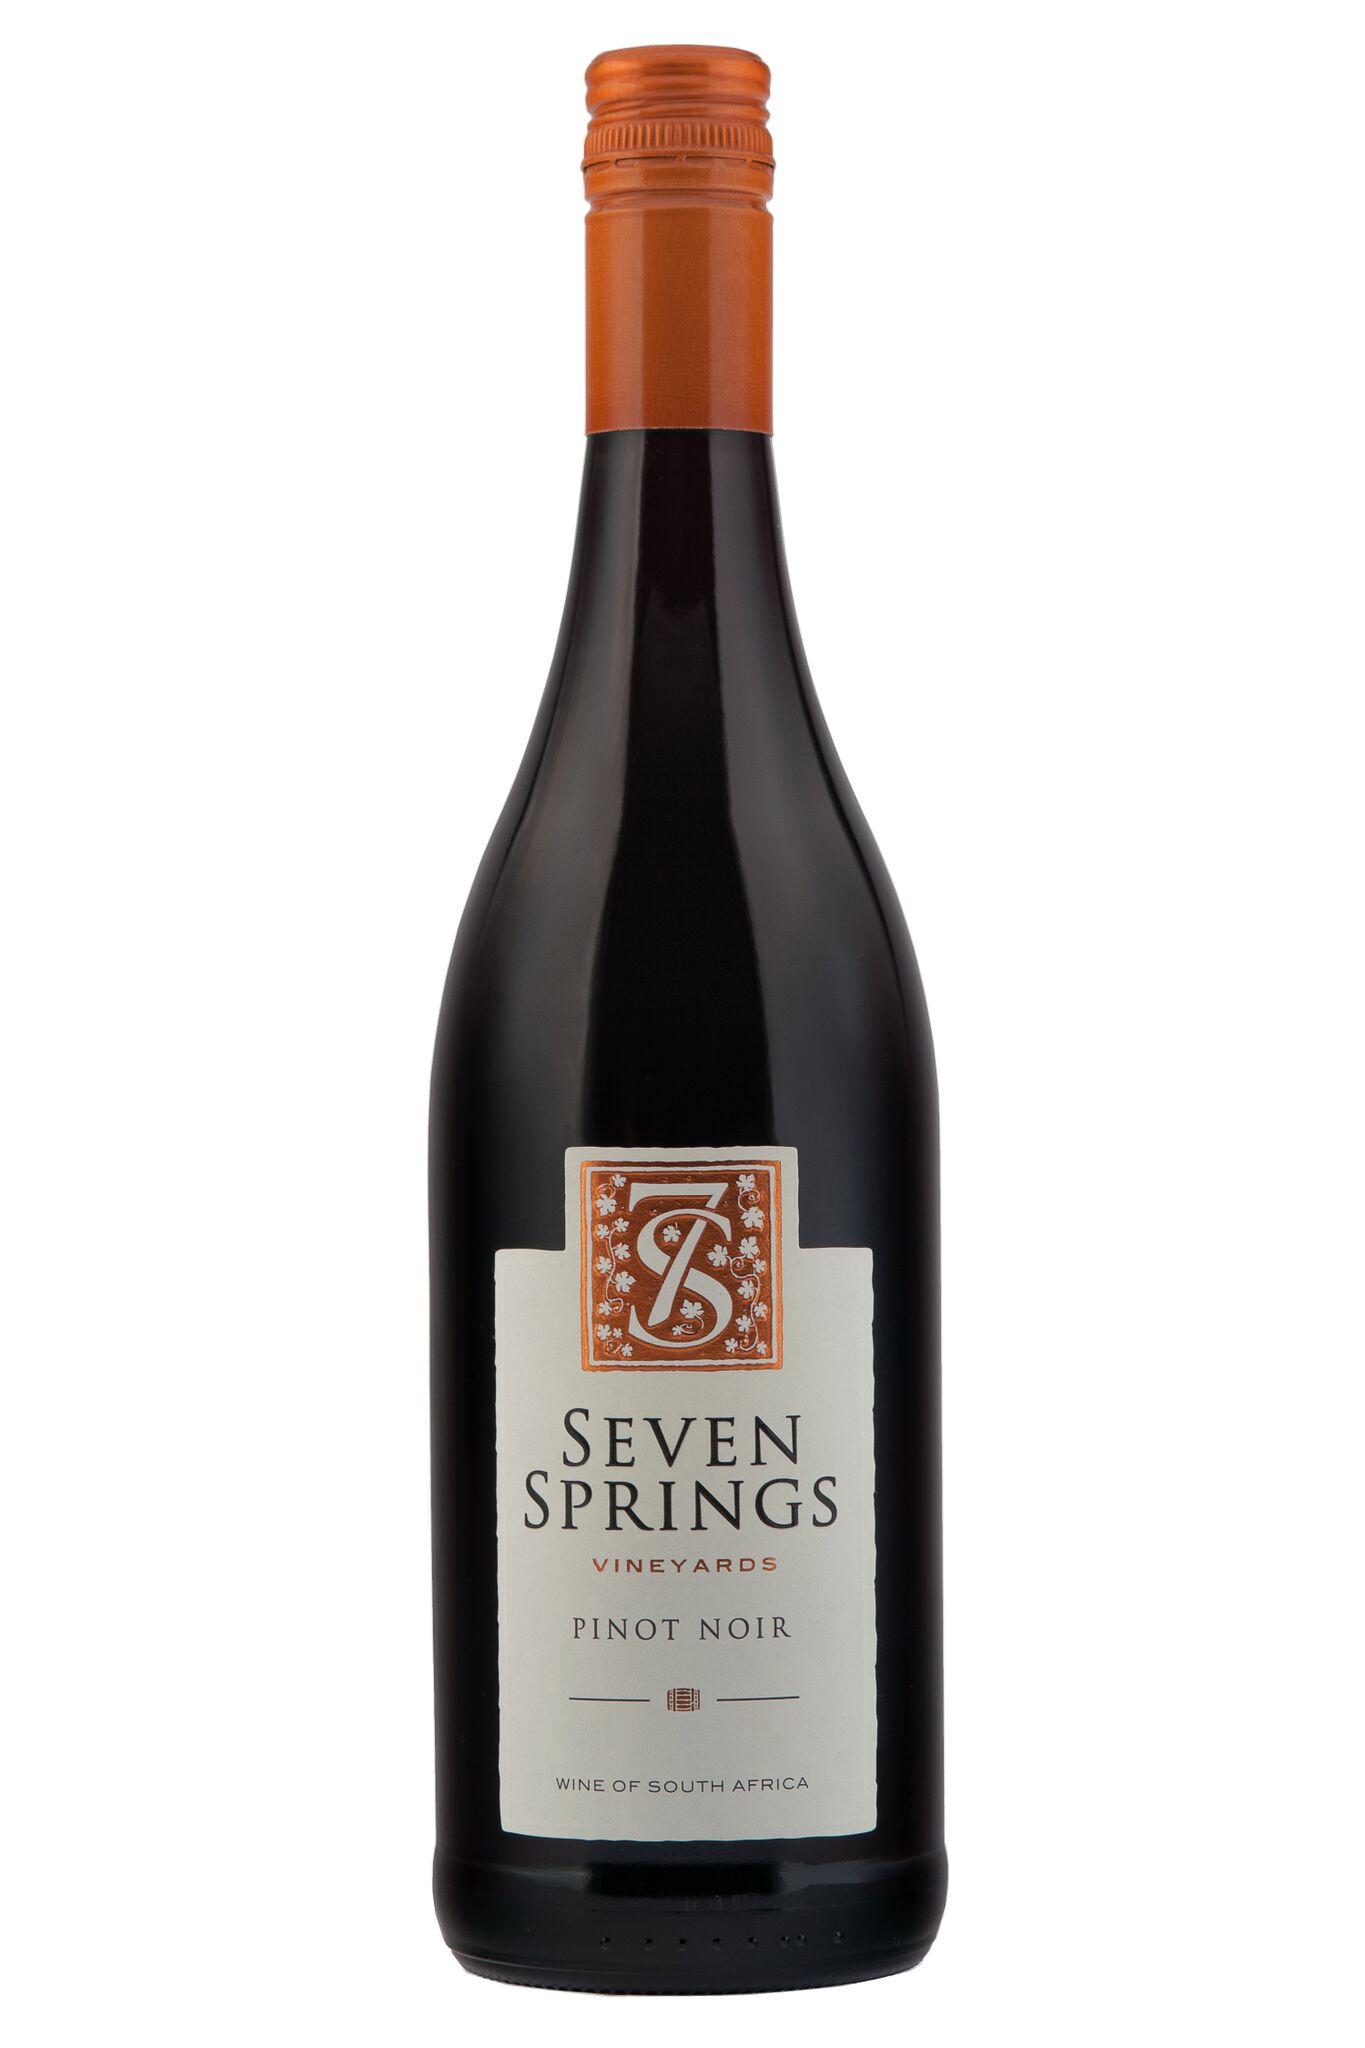 Seven Springs Pinot Noir